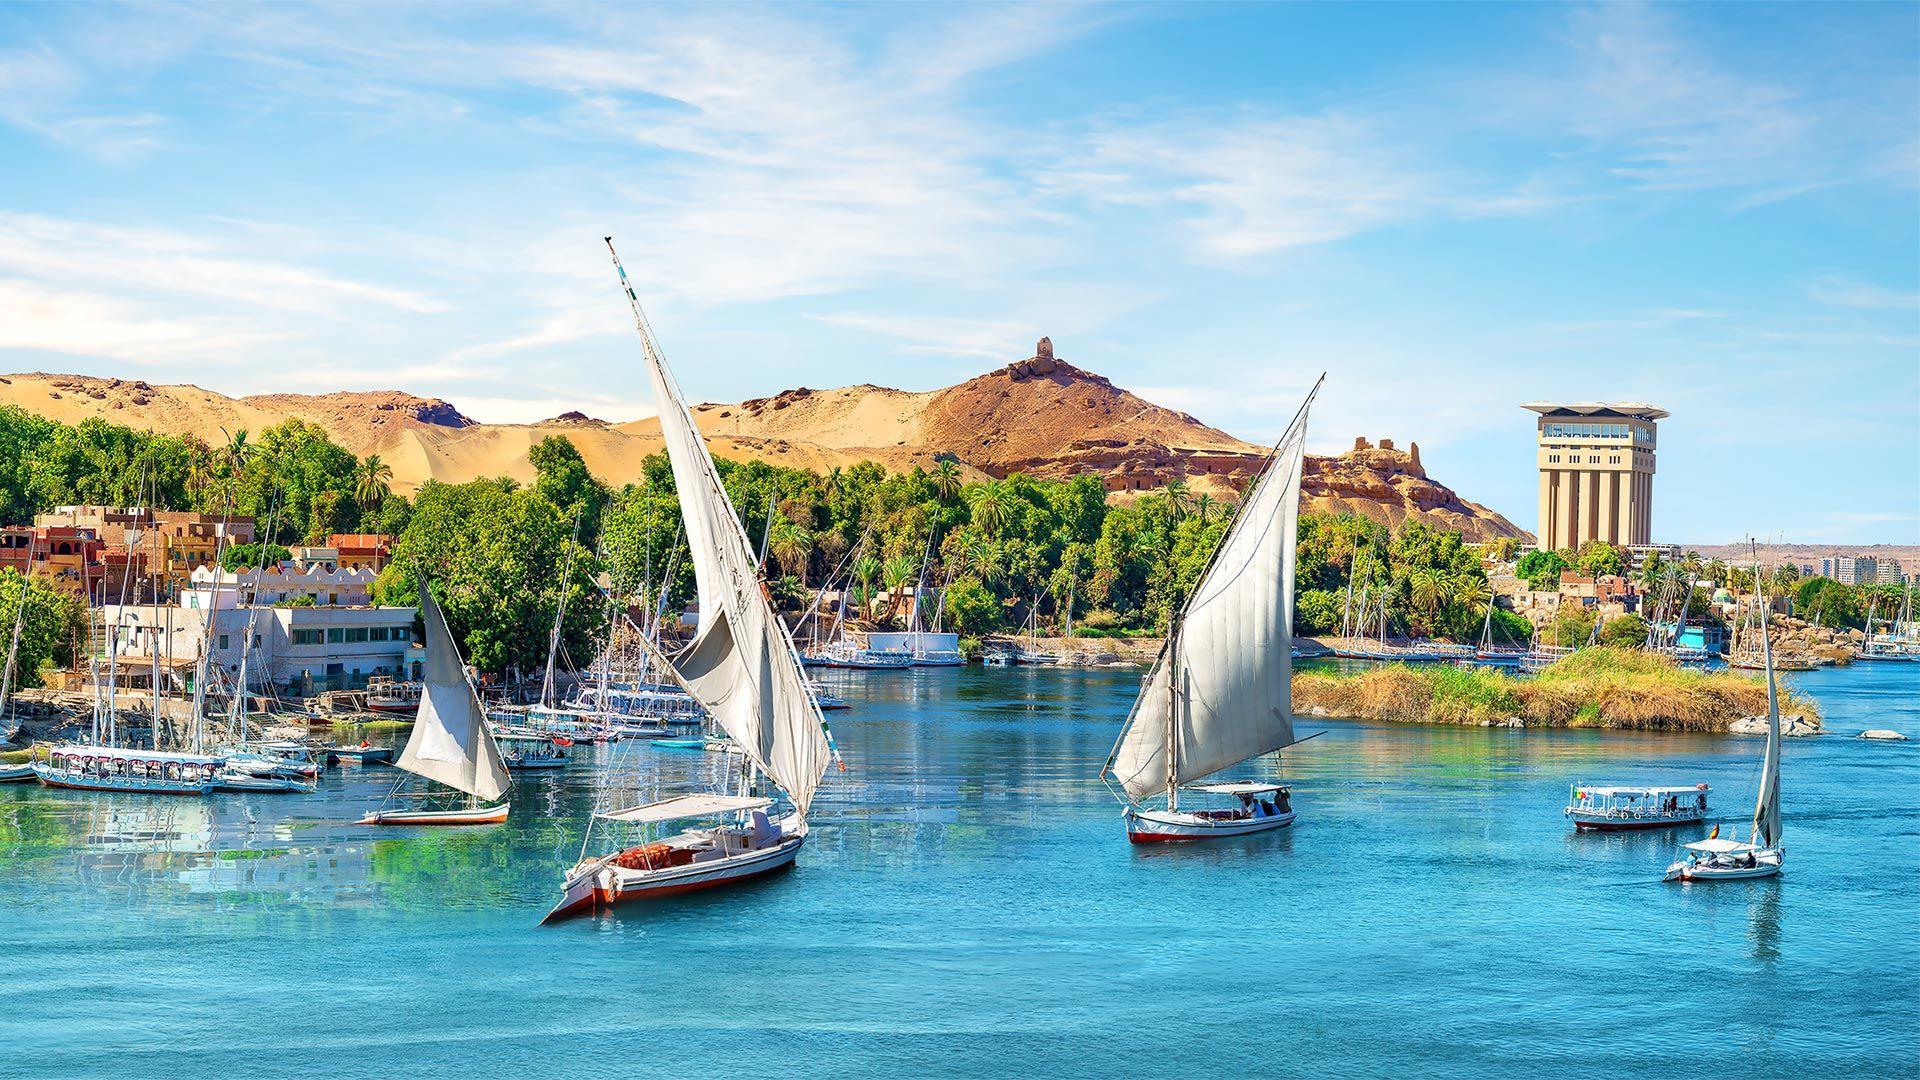 Circuit de grup - Luxury Experience Cairo & Private Cruise autentic pe Nil, 11 zile